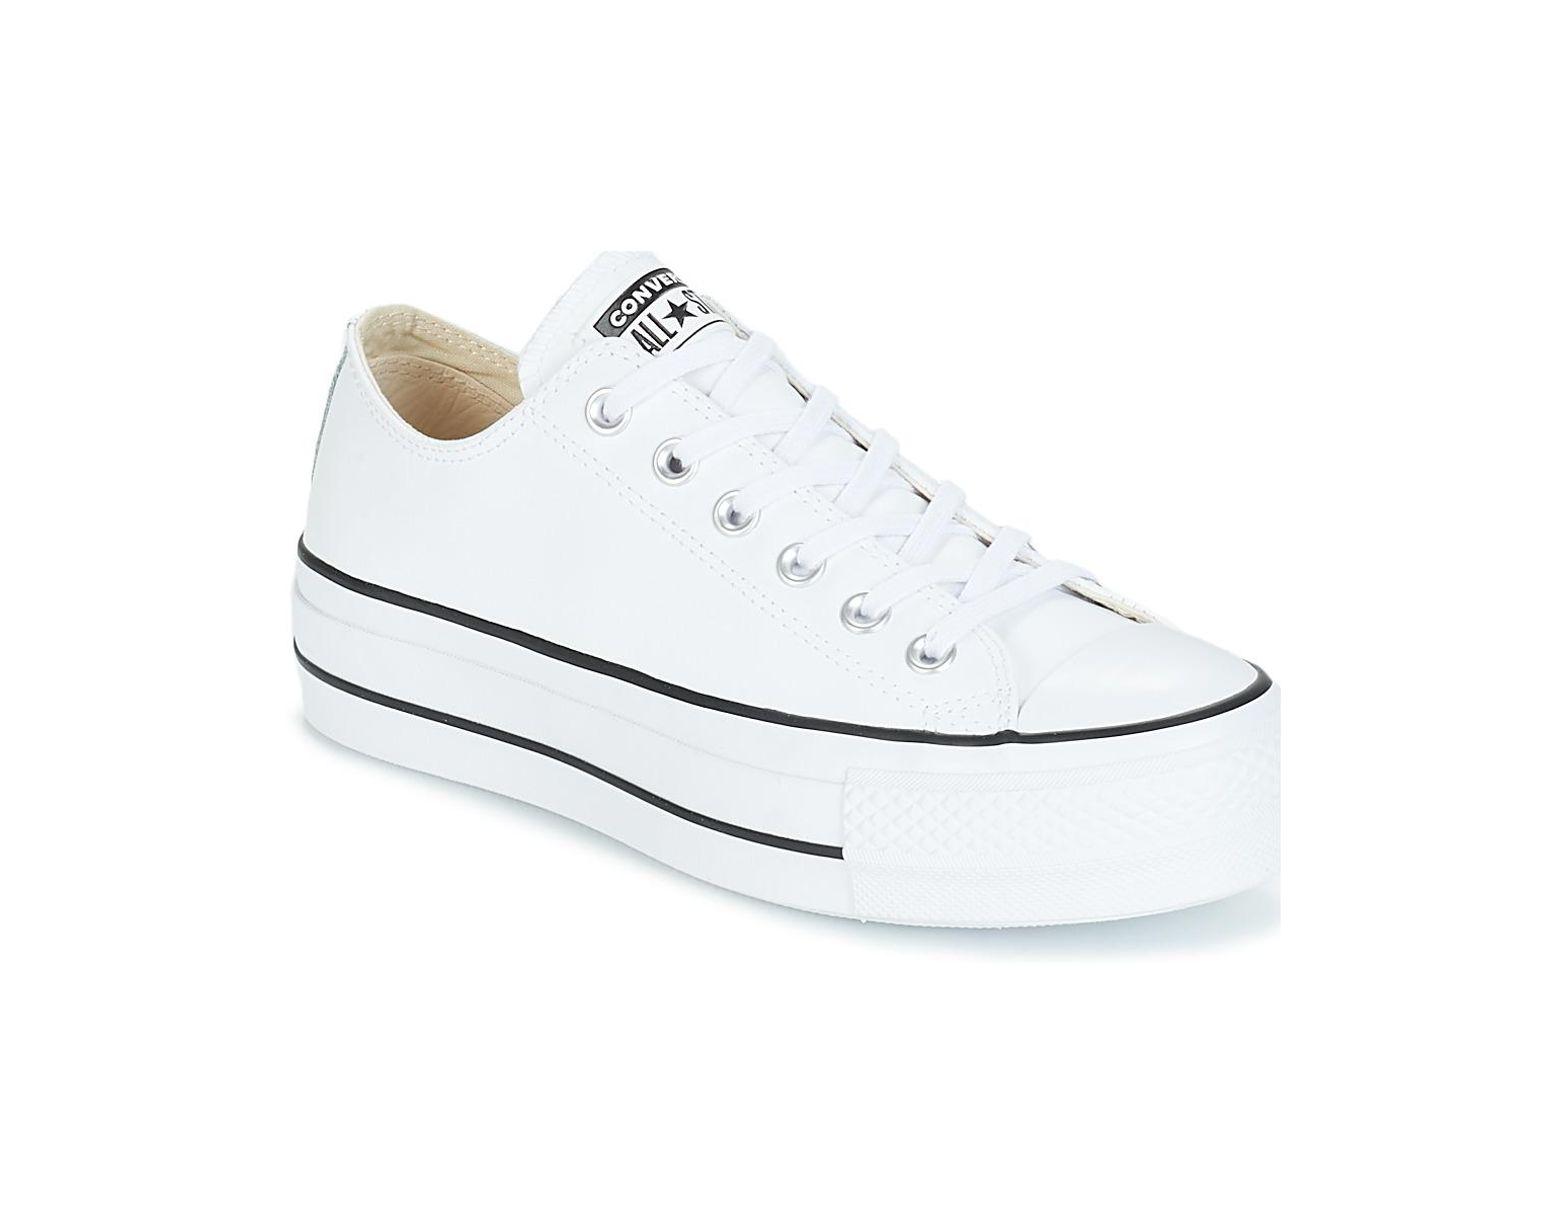 653d9352f CHUCK TAYLOR ALL STAR LIFT CLEAN OX femmes Chaussures en blanc